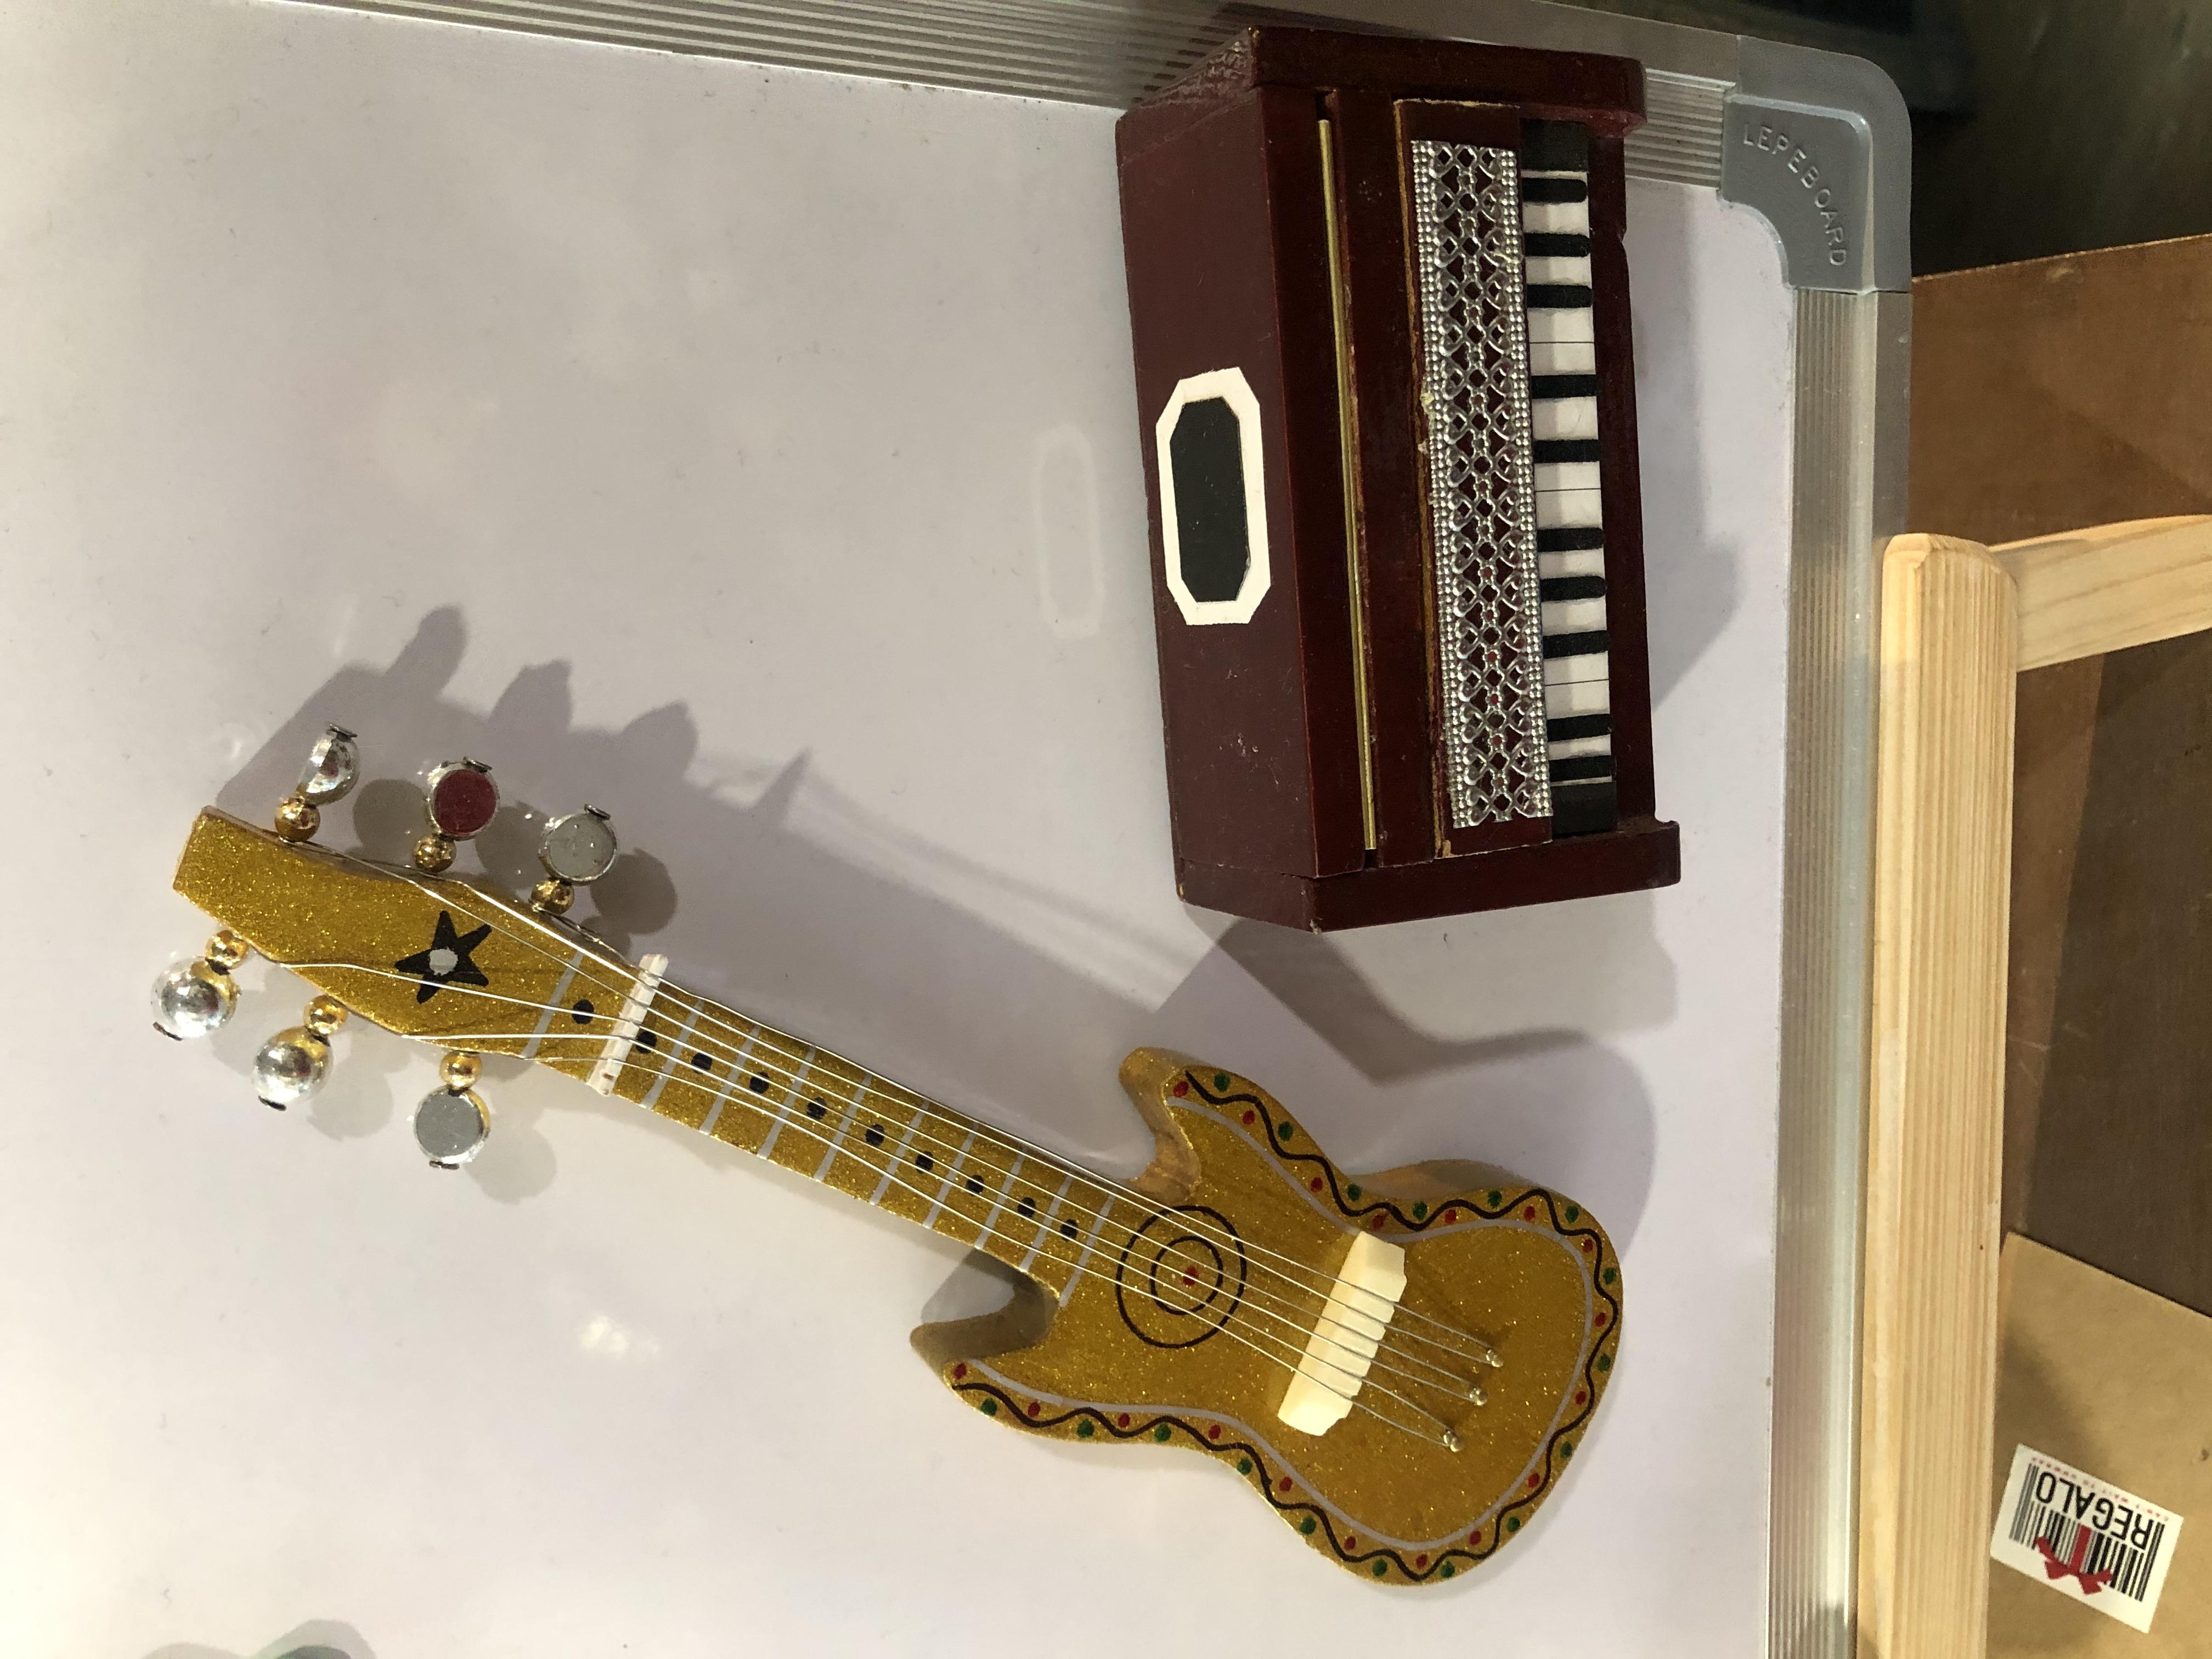 Musical instruments - refrigerator door magnets